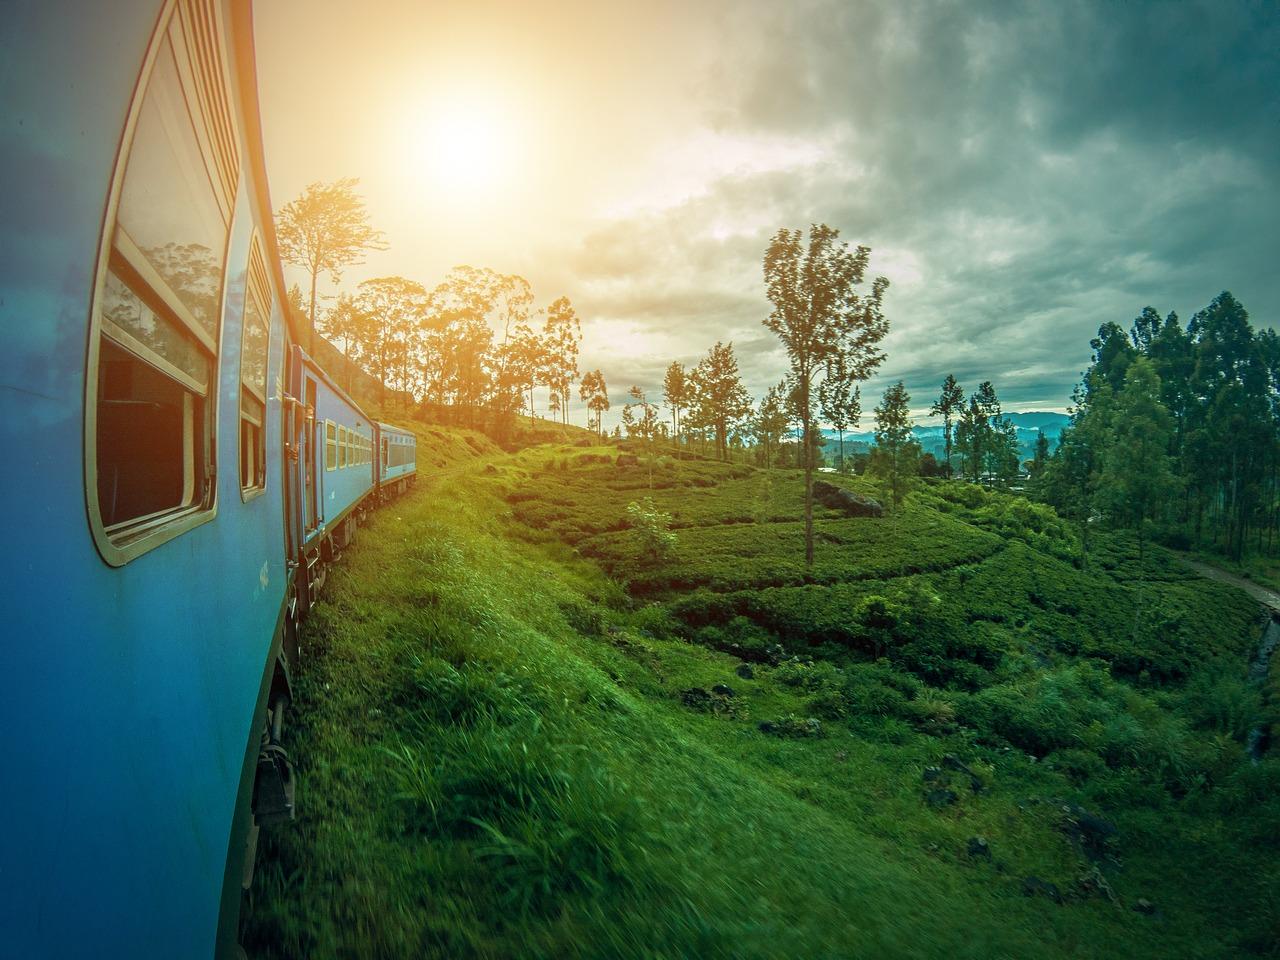 la culture Sri-lankaise datant